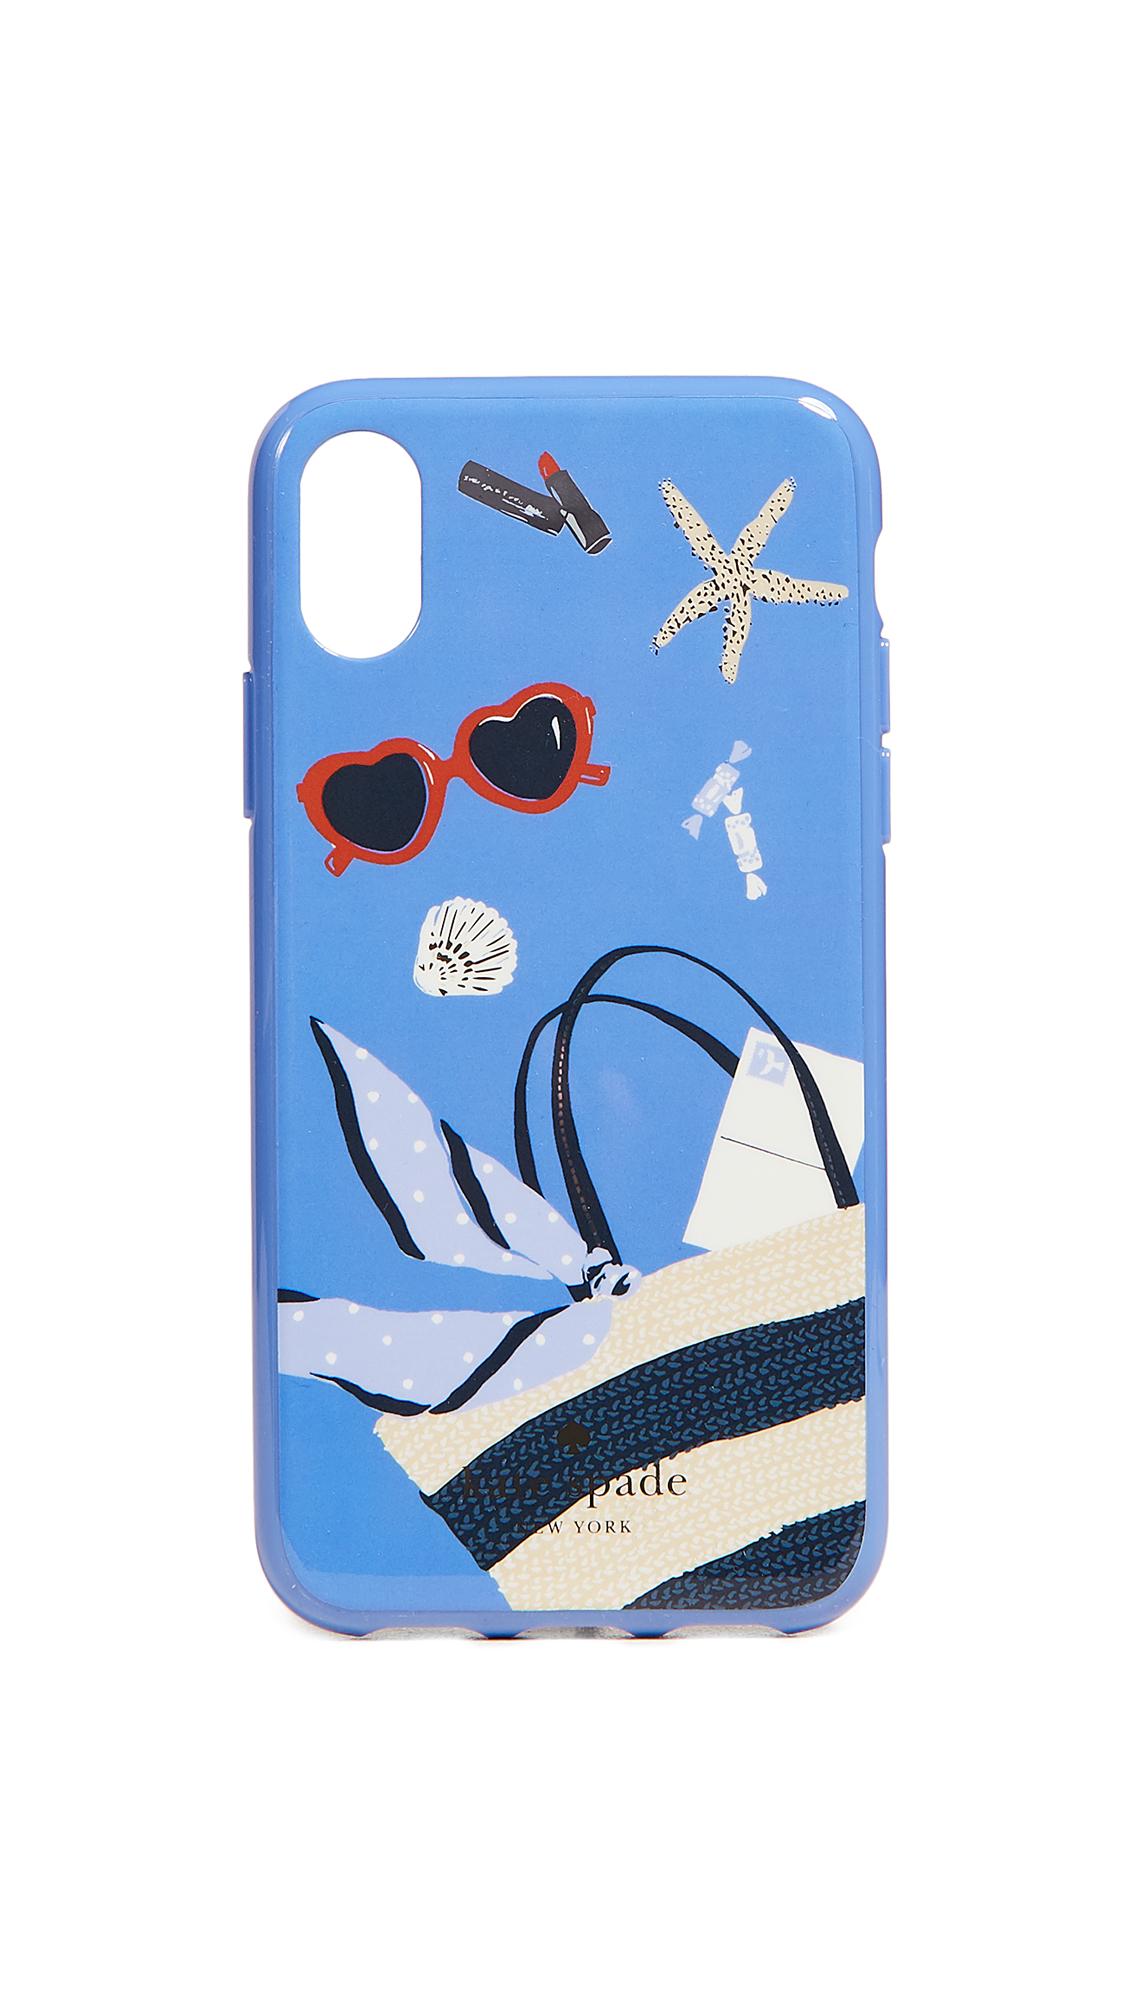 Kate Spade New York Beach Bag iPhone X Case